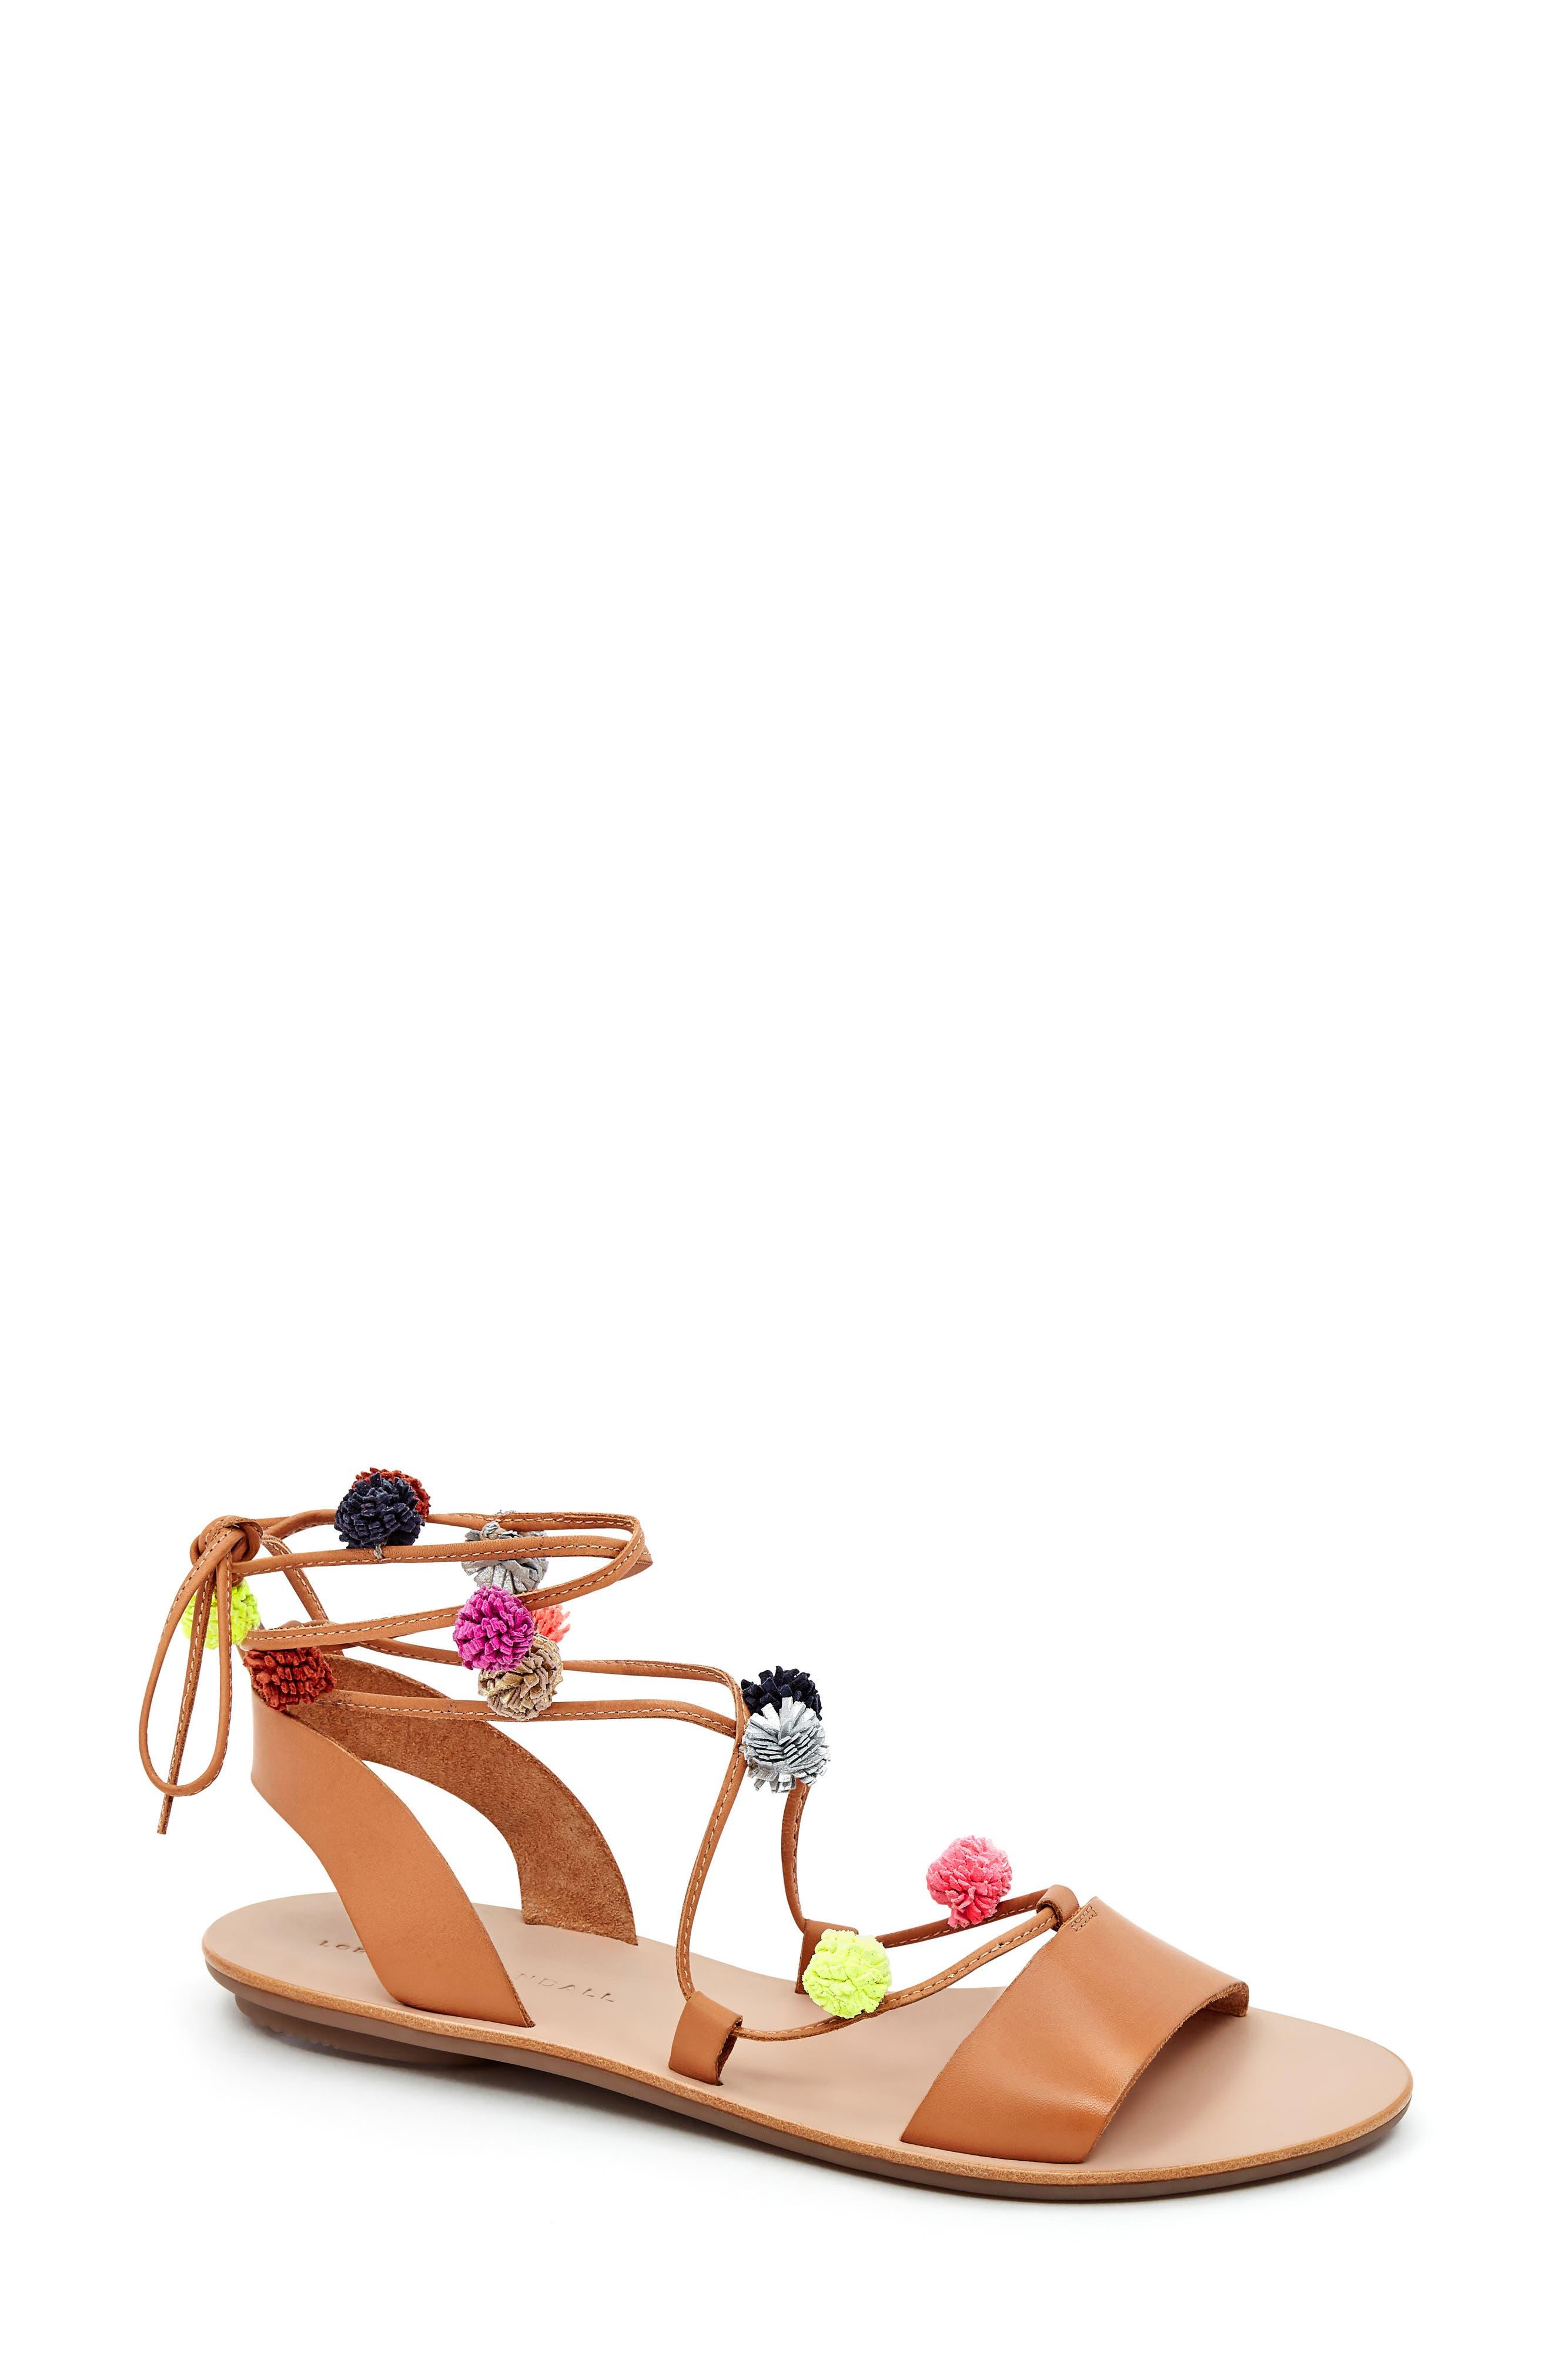 'Saskia' Flat Sandal,                             Main thumbnail 1, color,                             209